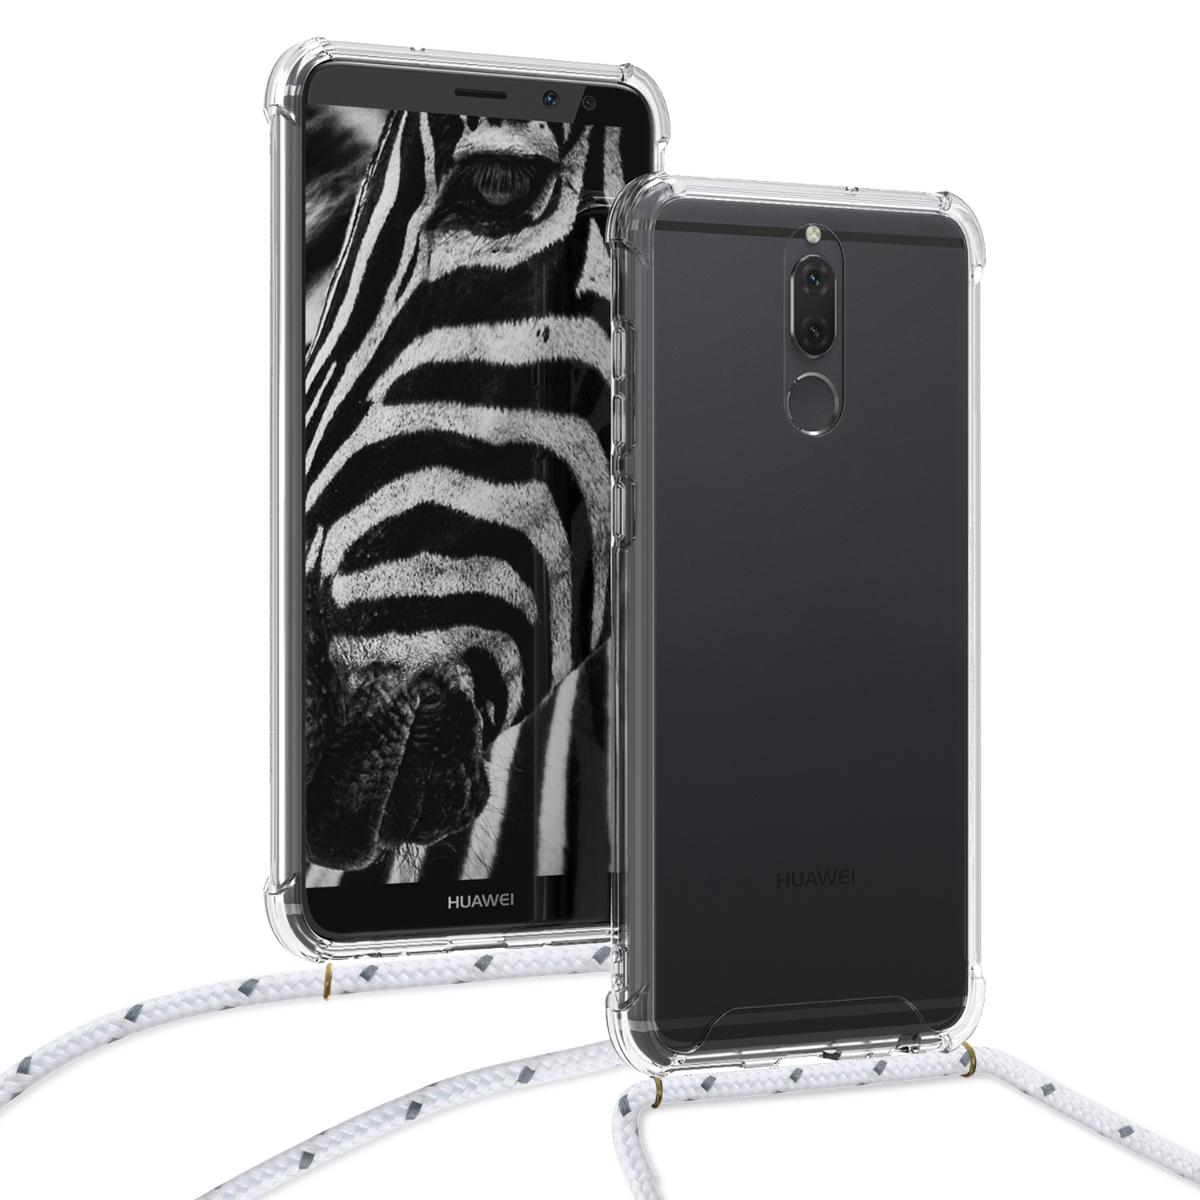 KW Θήκη Σιλικόνης με Λουράκι Λαιμού Huawei Mate 10 Lite - Transparent / White (48850.02)